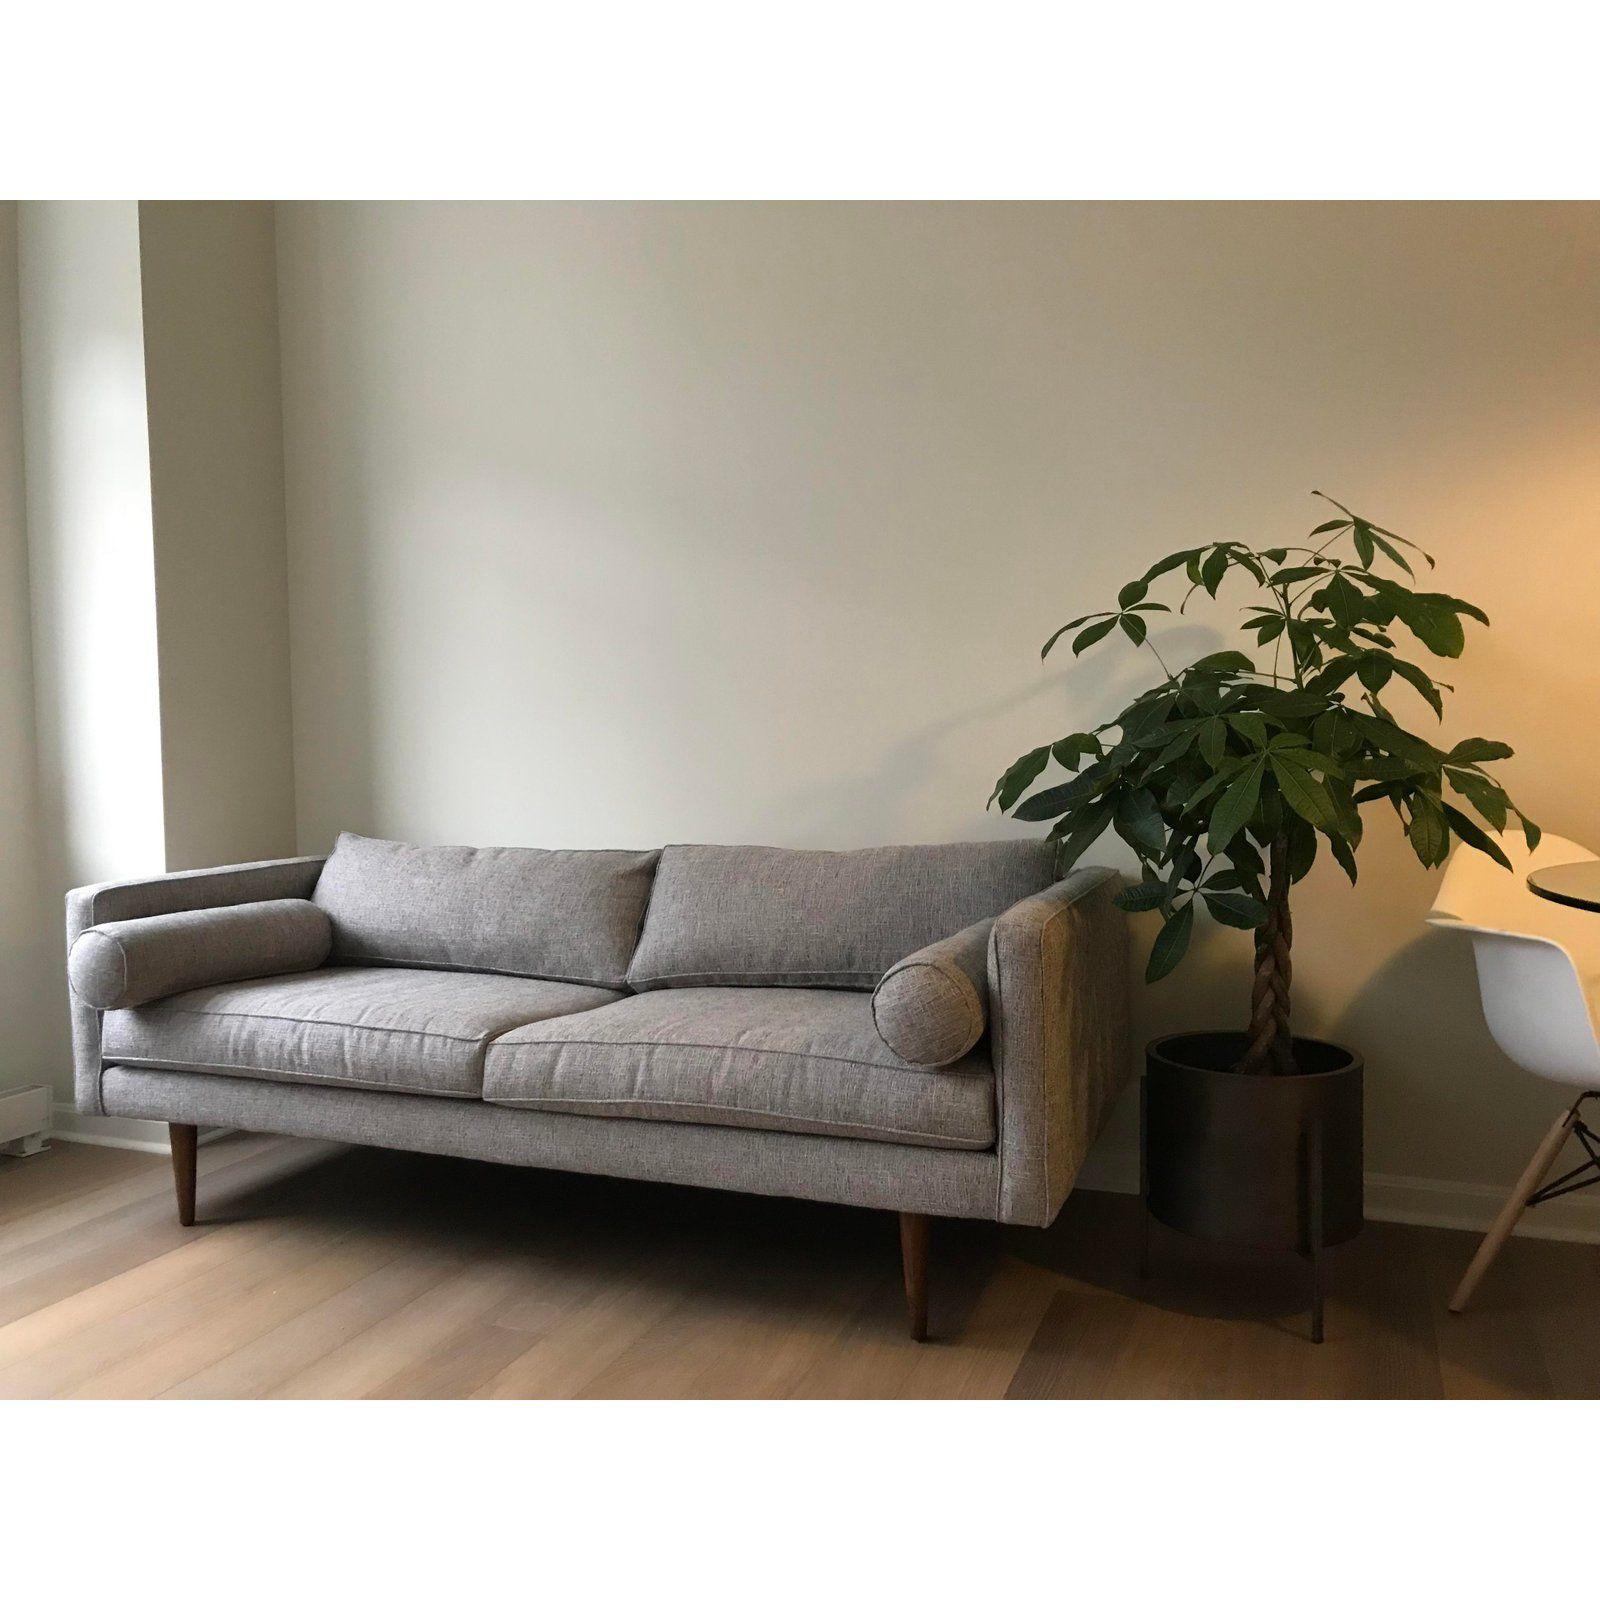 Mid Century Style Light Grey Sofa For Sale In Pittsburgh Image 6 Of 6 Gray Sofa Mid Century Sofa Grey Mid Century Sofa